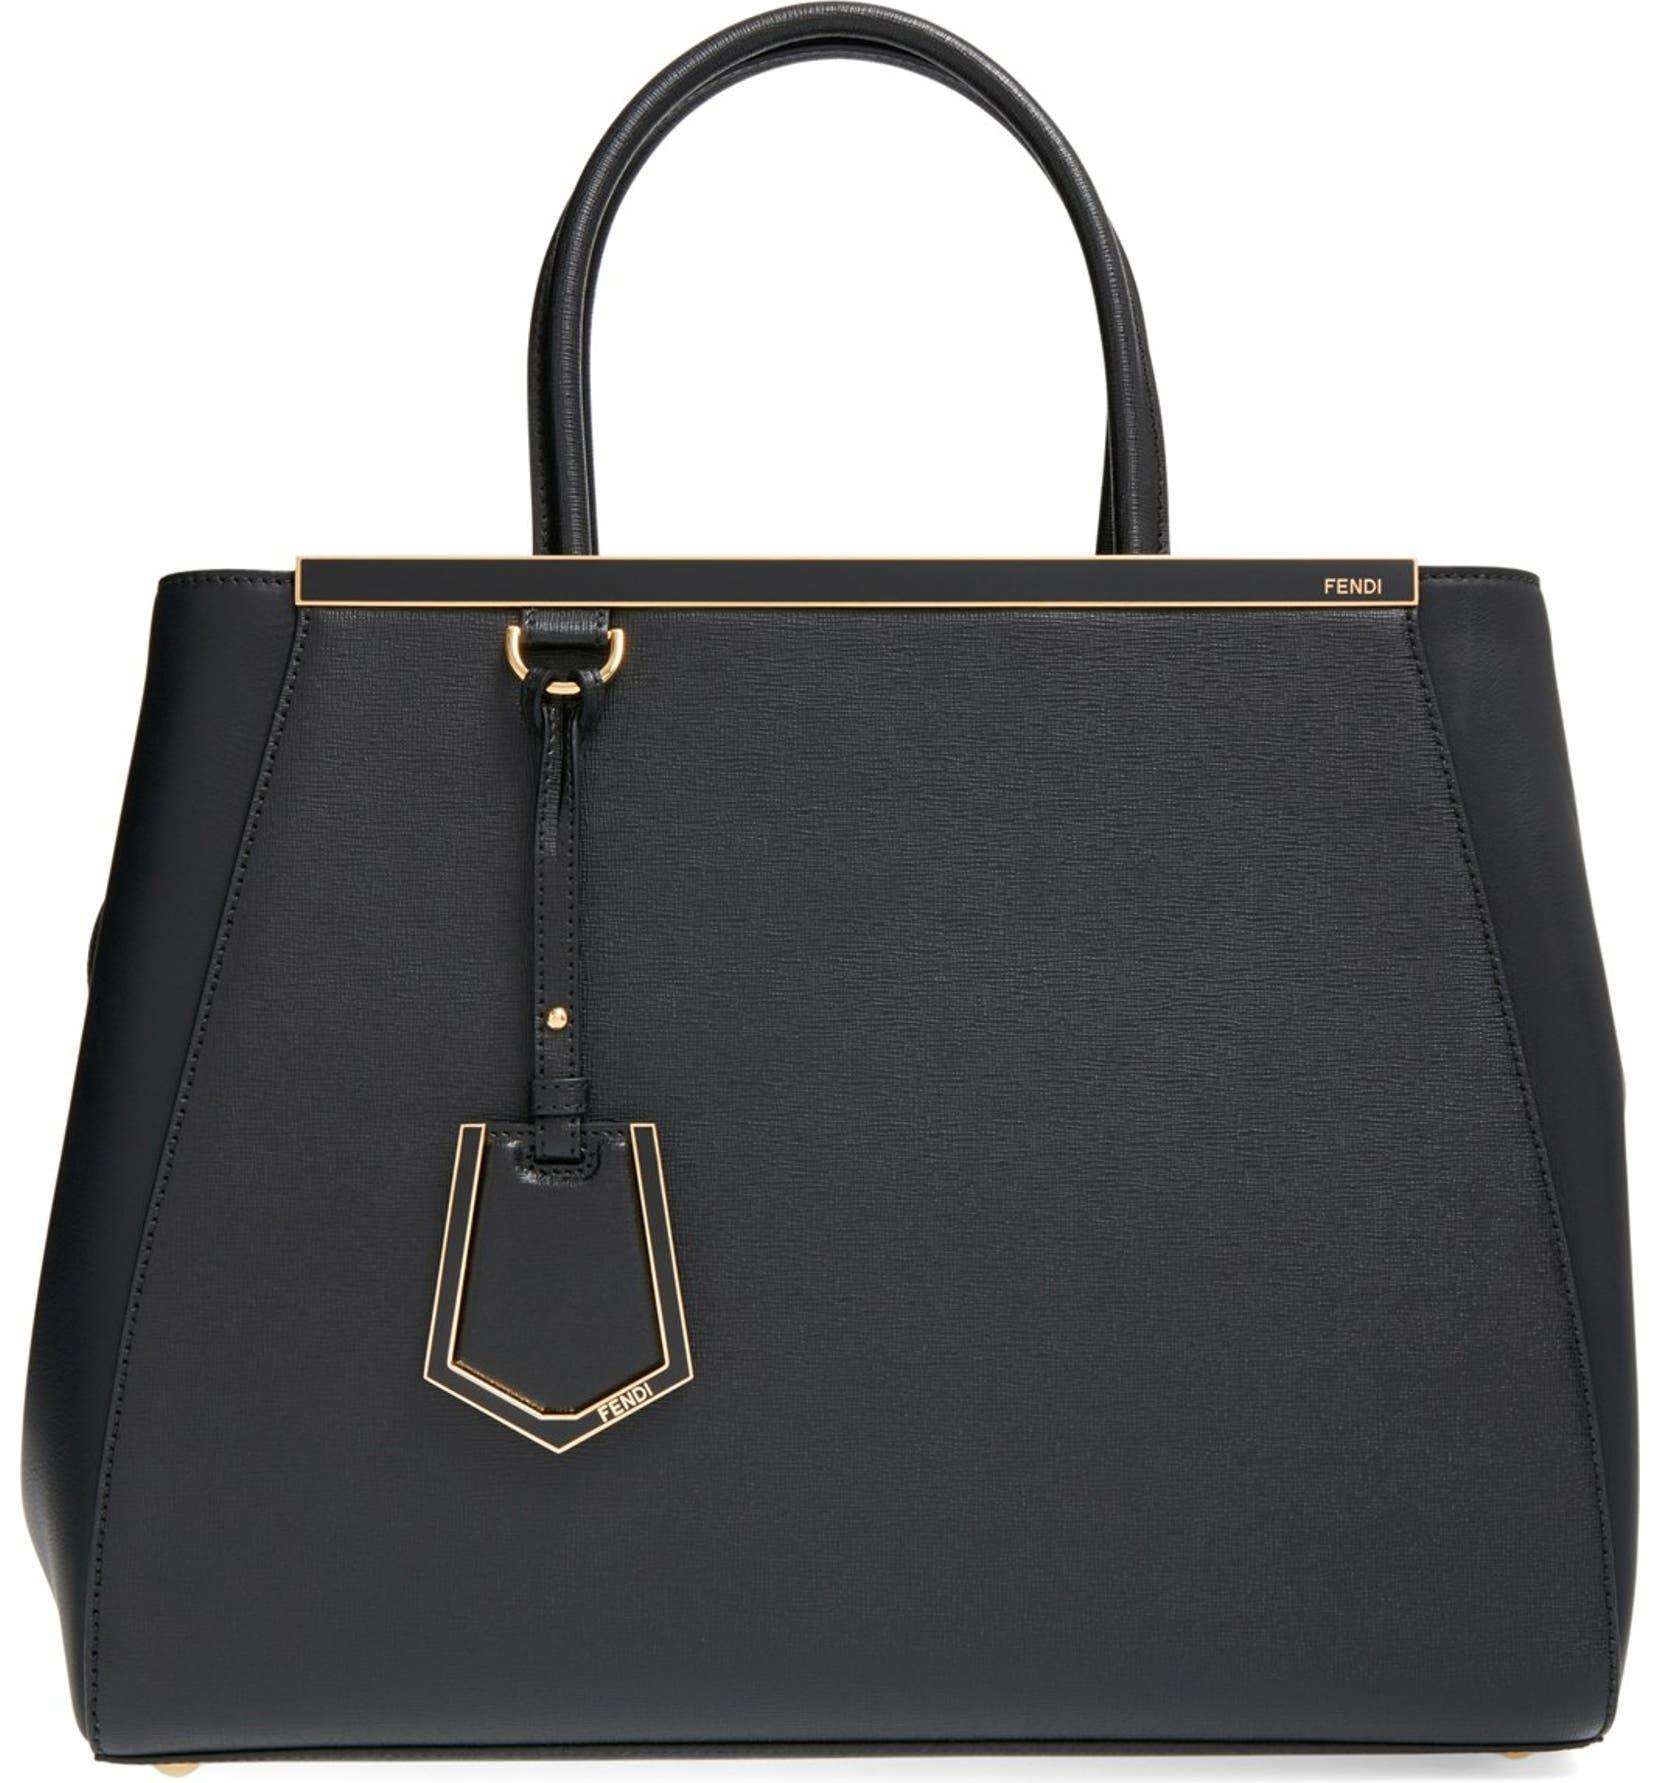 6c9d7e8eb Fendi '2Jours Elite' Leather Shopper   Nordstrom